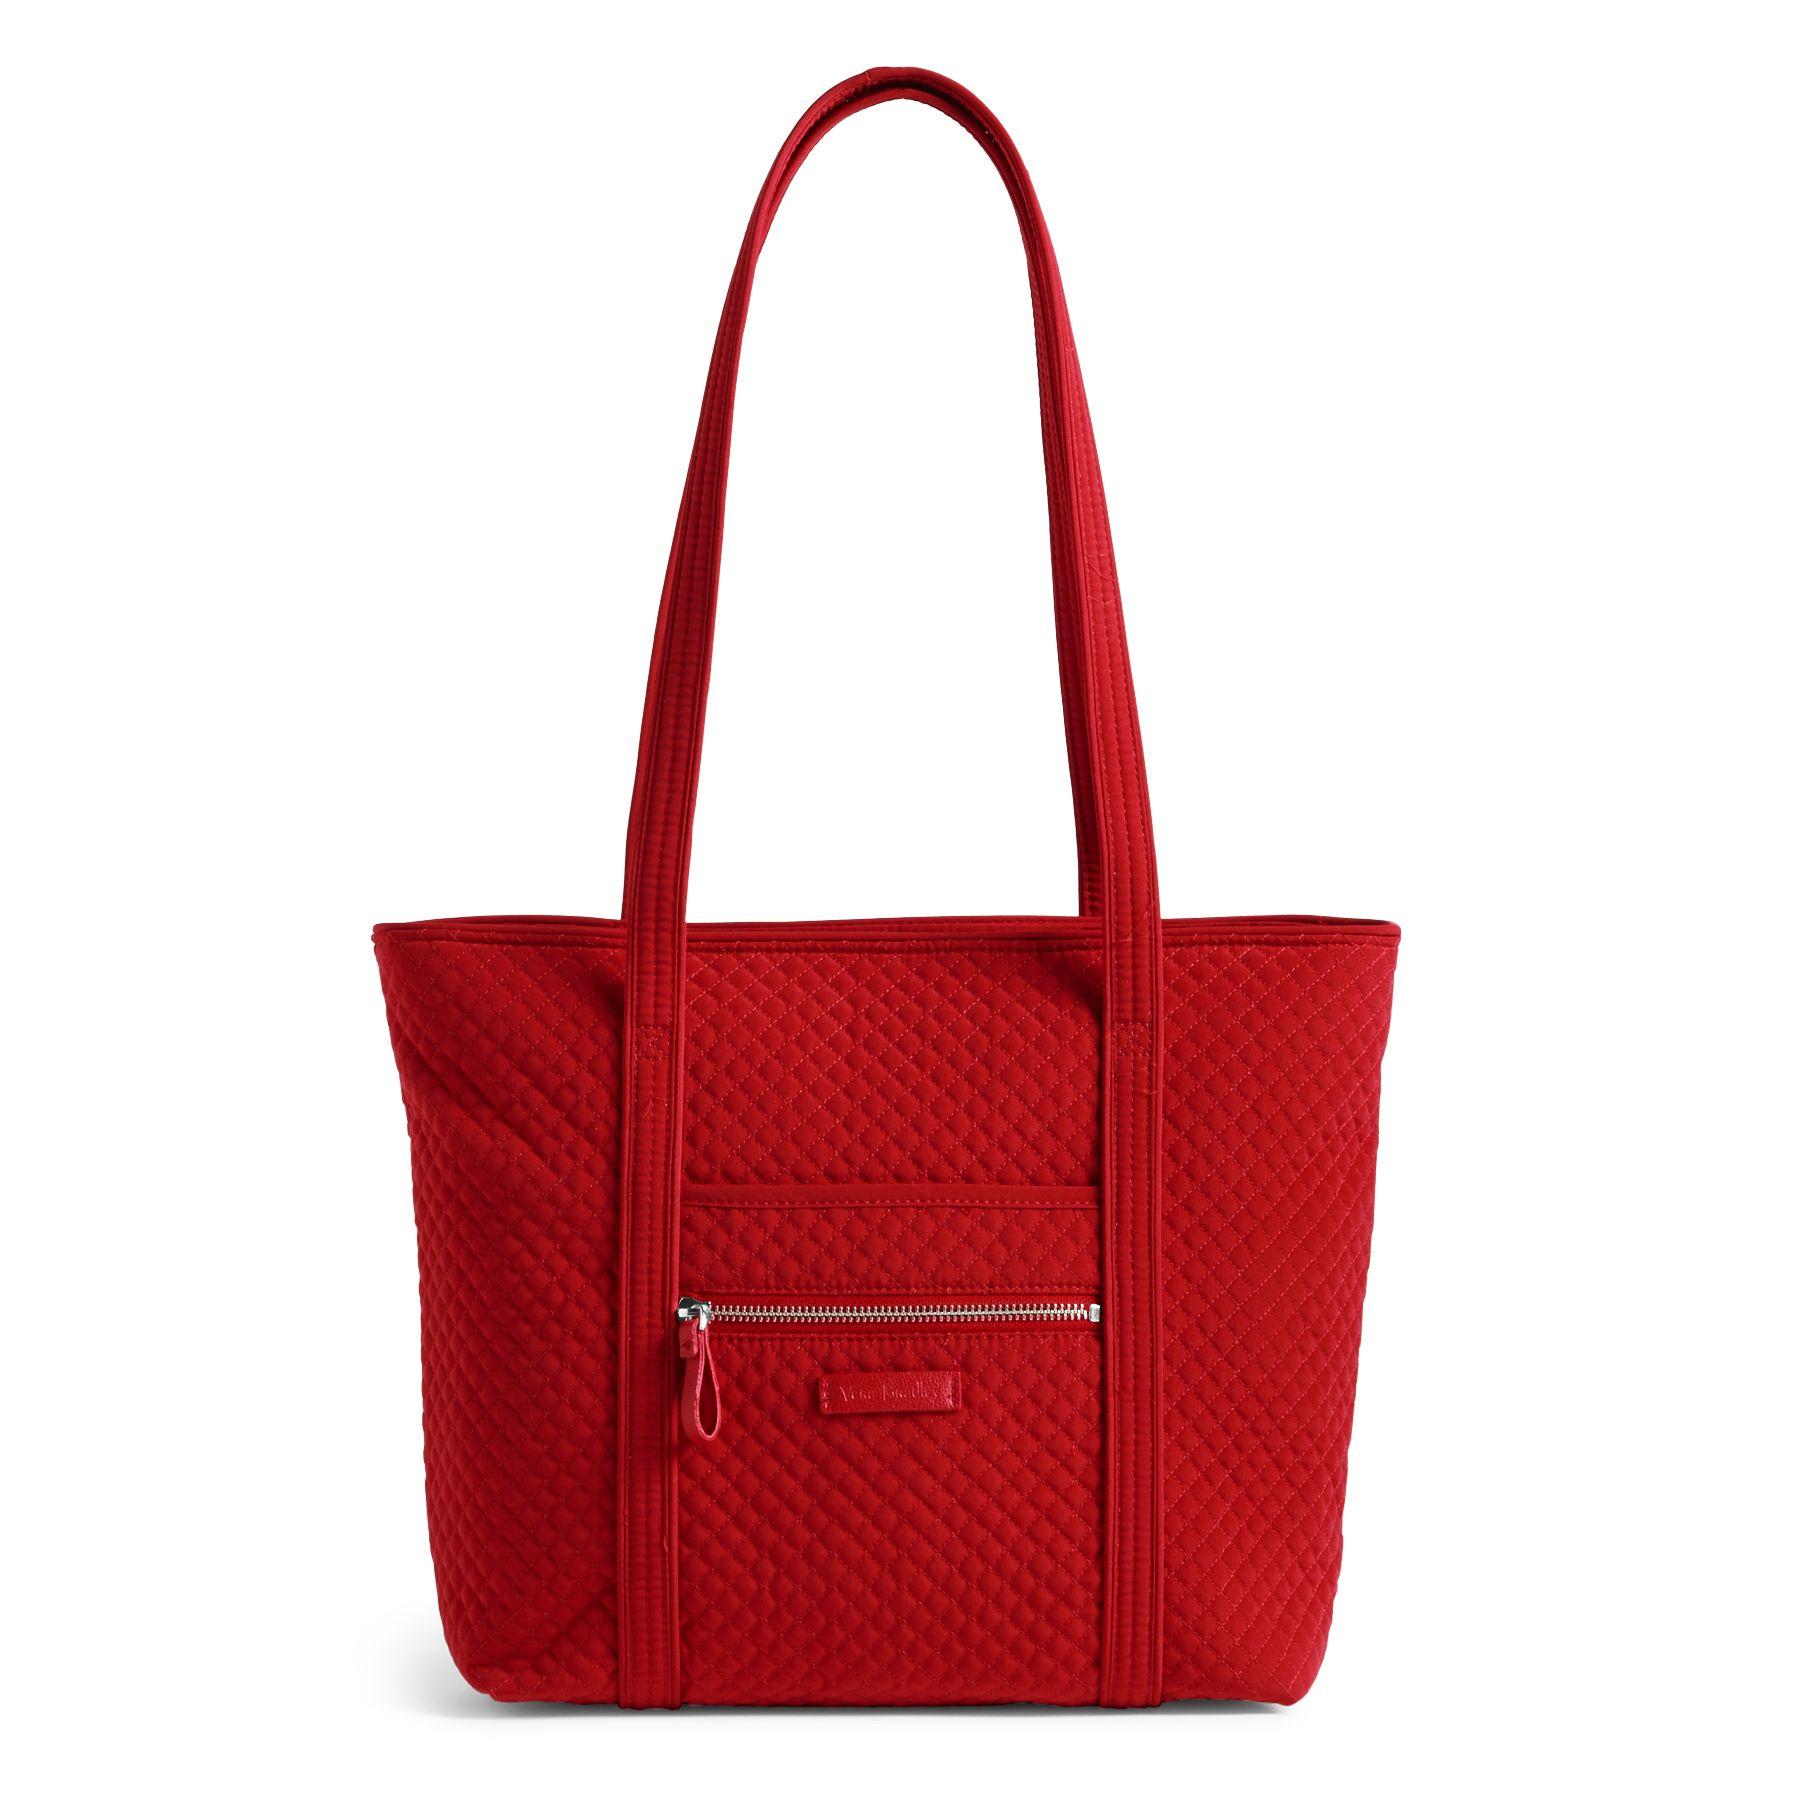 Vera Bradley Iconic Small Vera Women's Tote Bag in Cardinal RedTotes